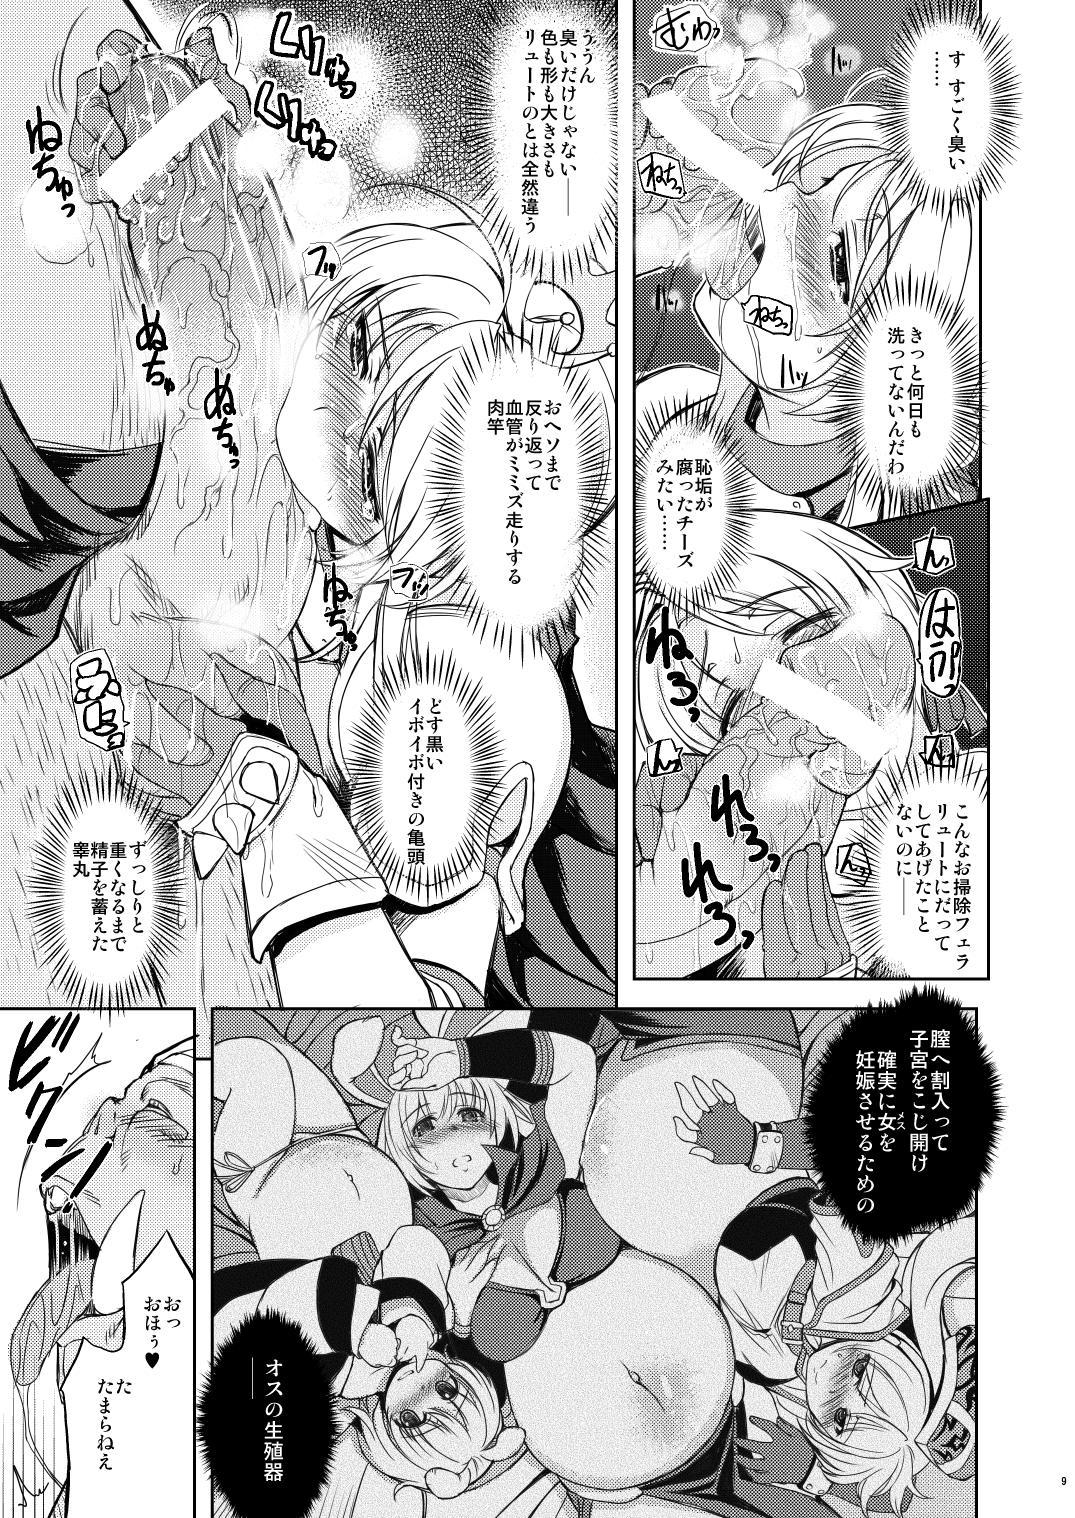 Hime Kishi Tame 1 7